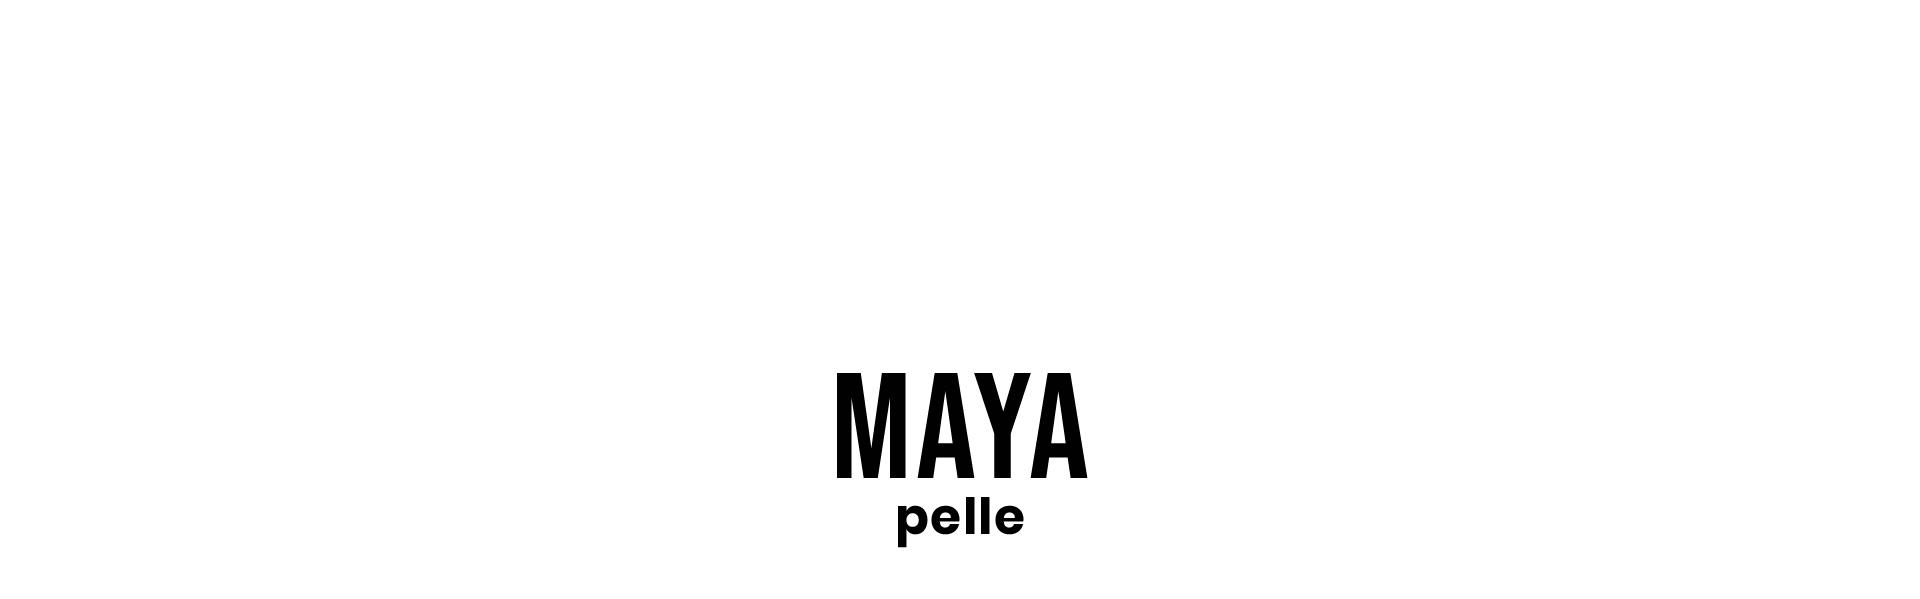 maya - Copia